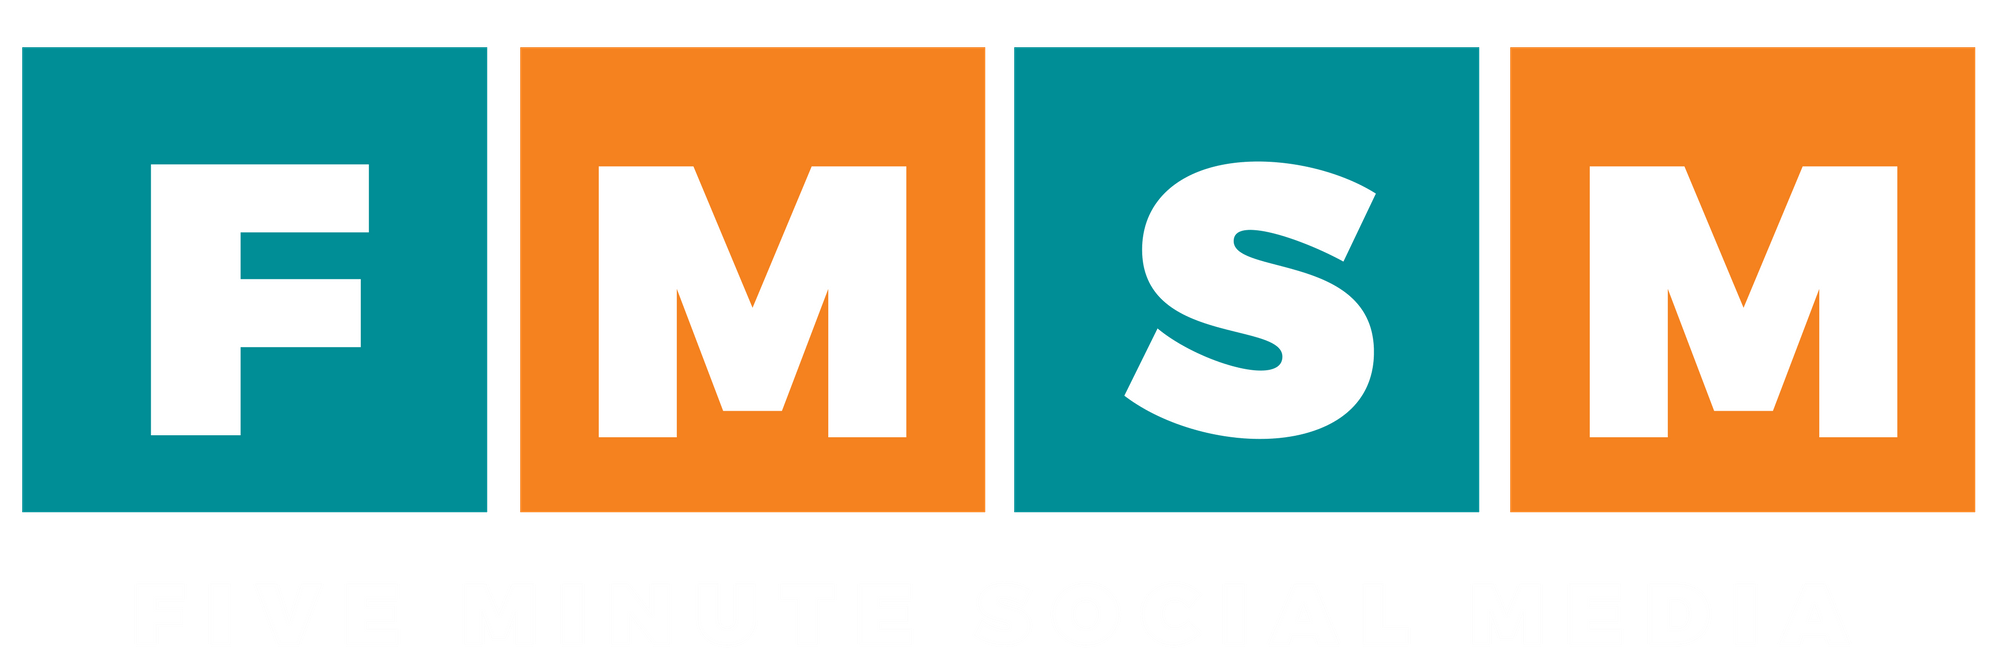 Five Minute Social Media Logo - Horizontal, White